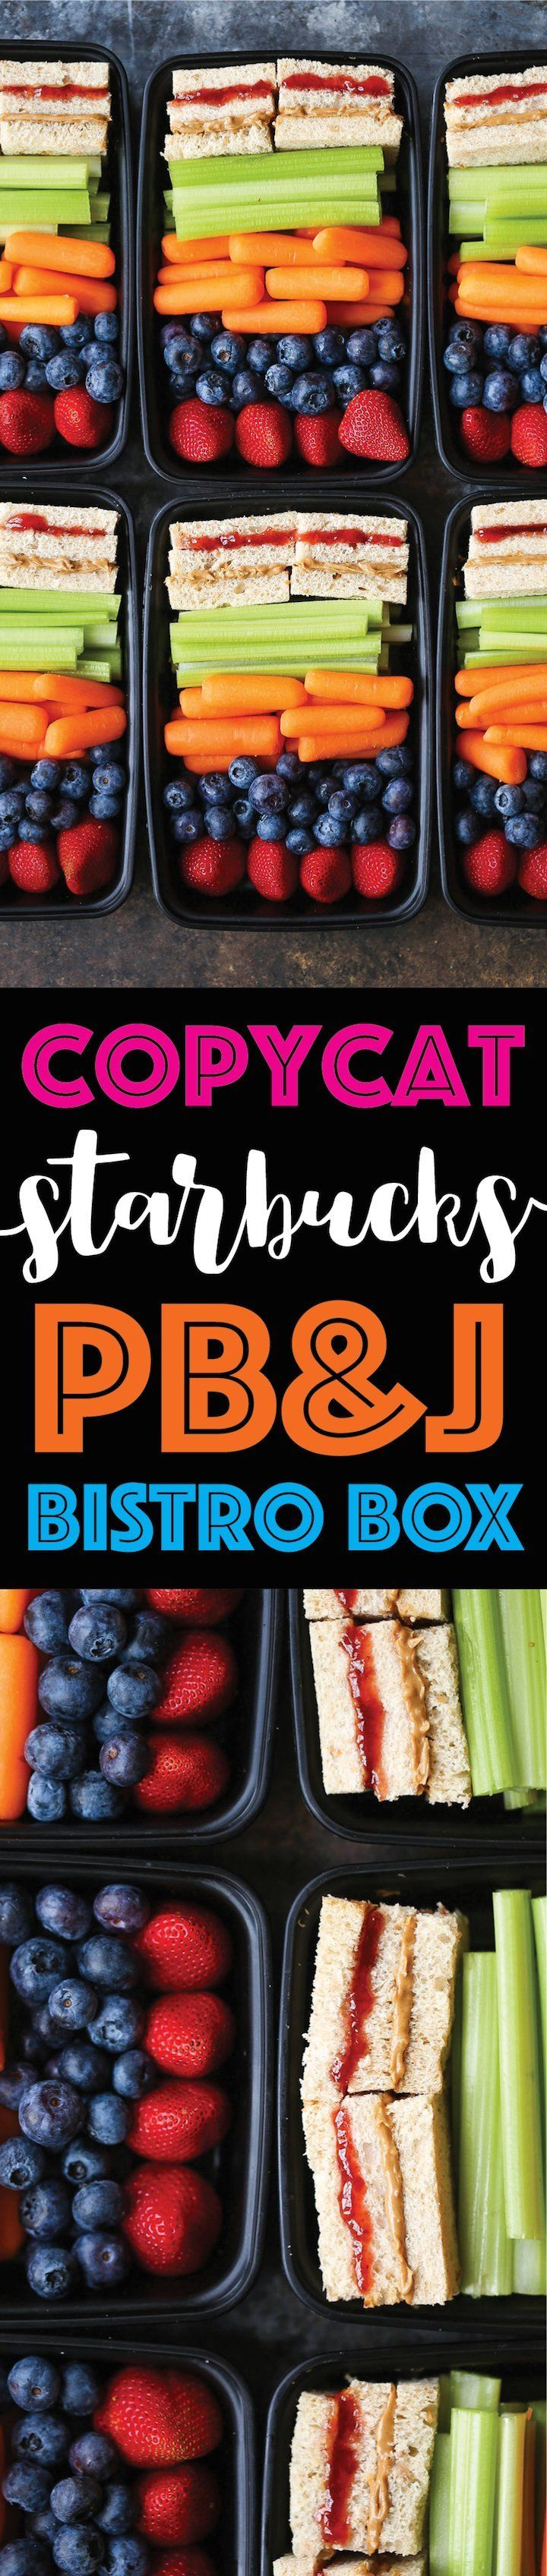 Copycat Starbucks PB&J Bistro Box @FoodBlogs